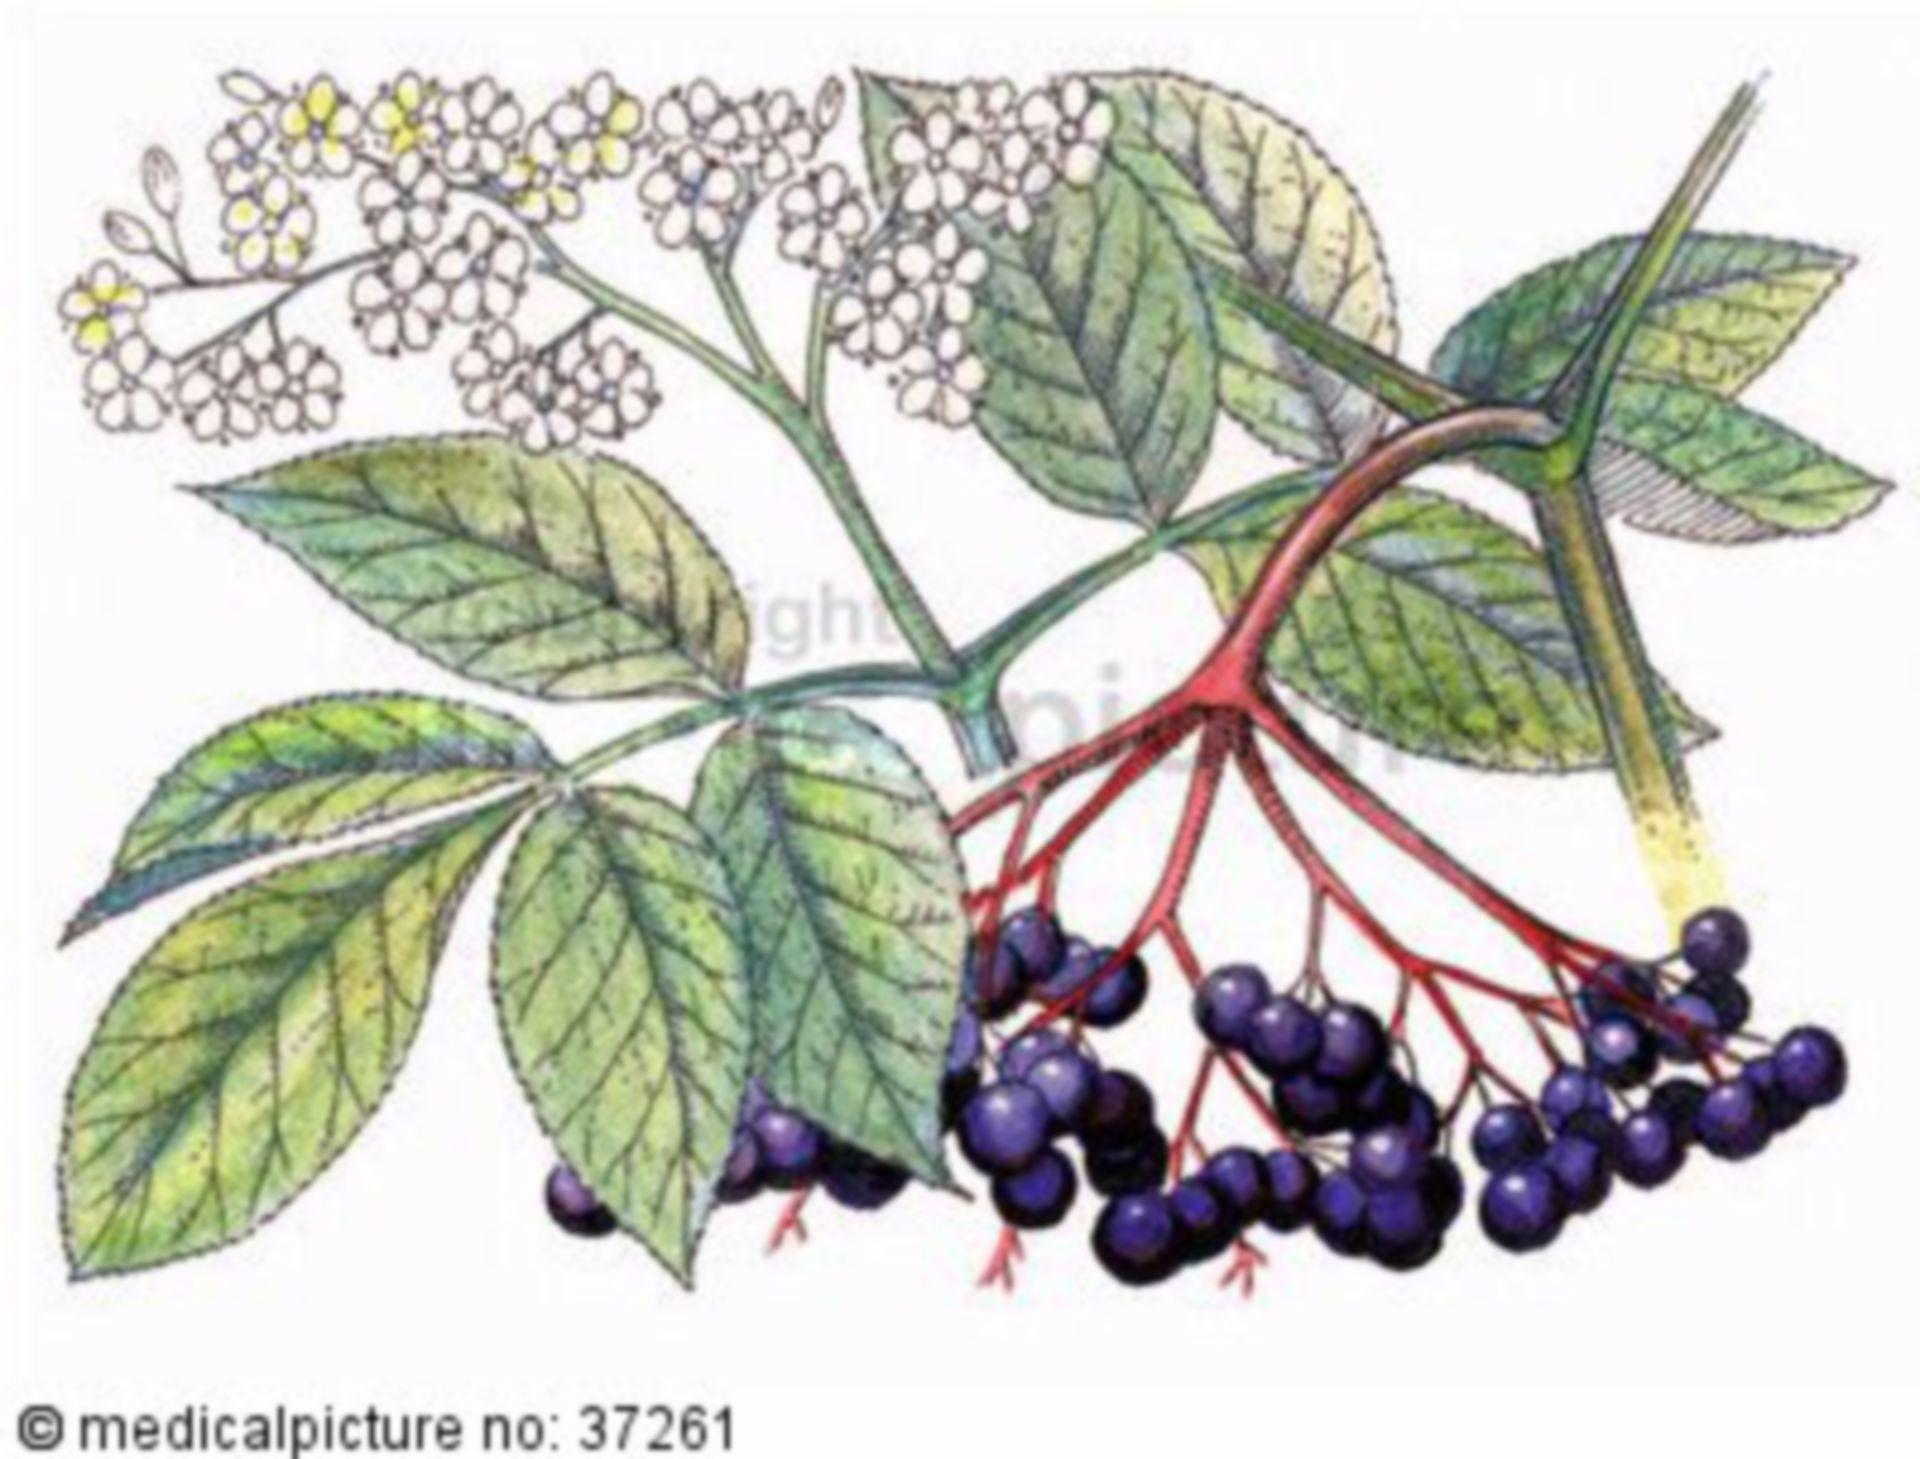 Shrub, Sambucus nigra, black elderberry